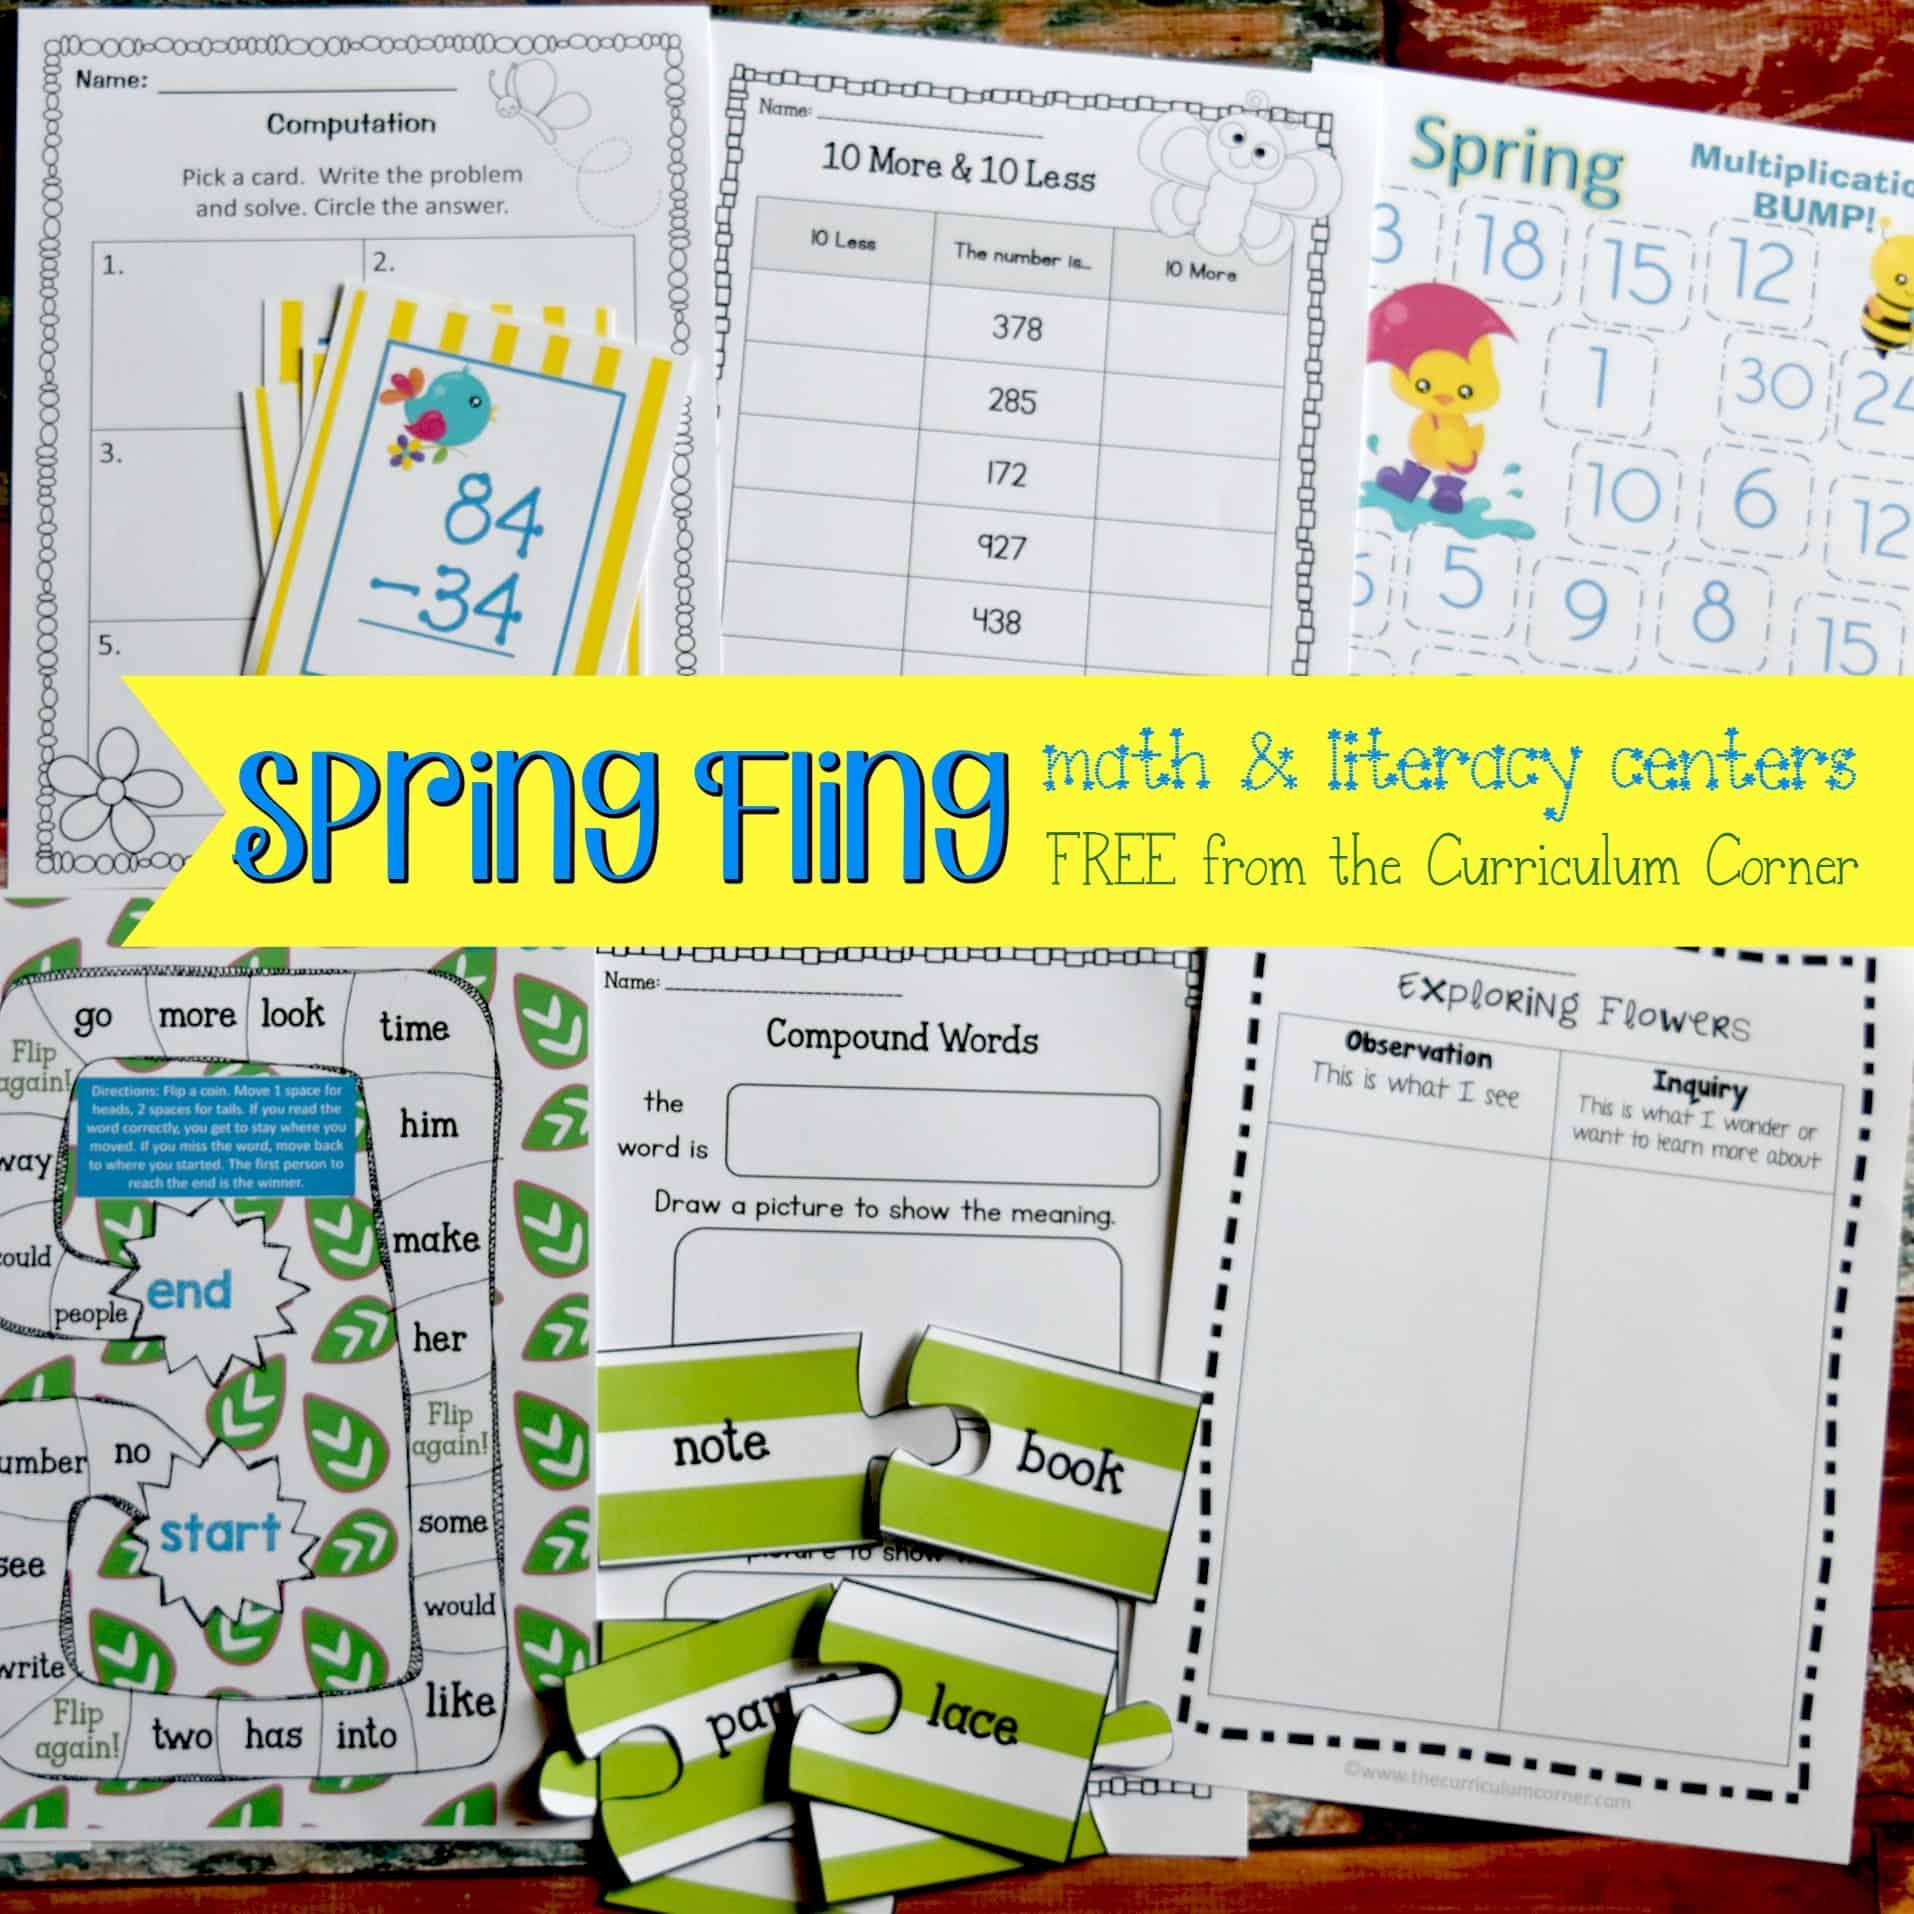 Spring Fling Math & Literacy Centers